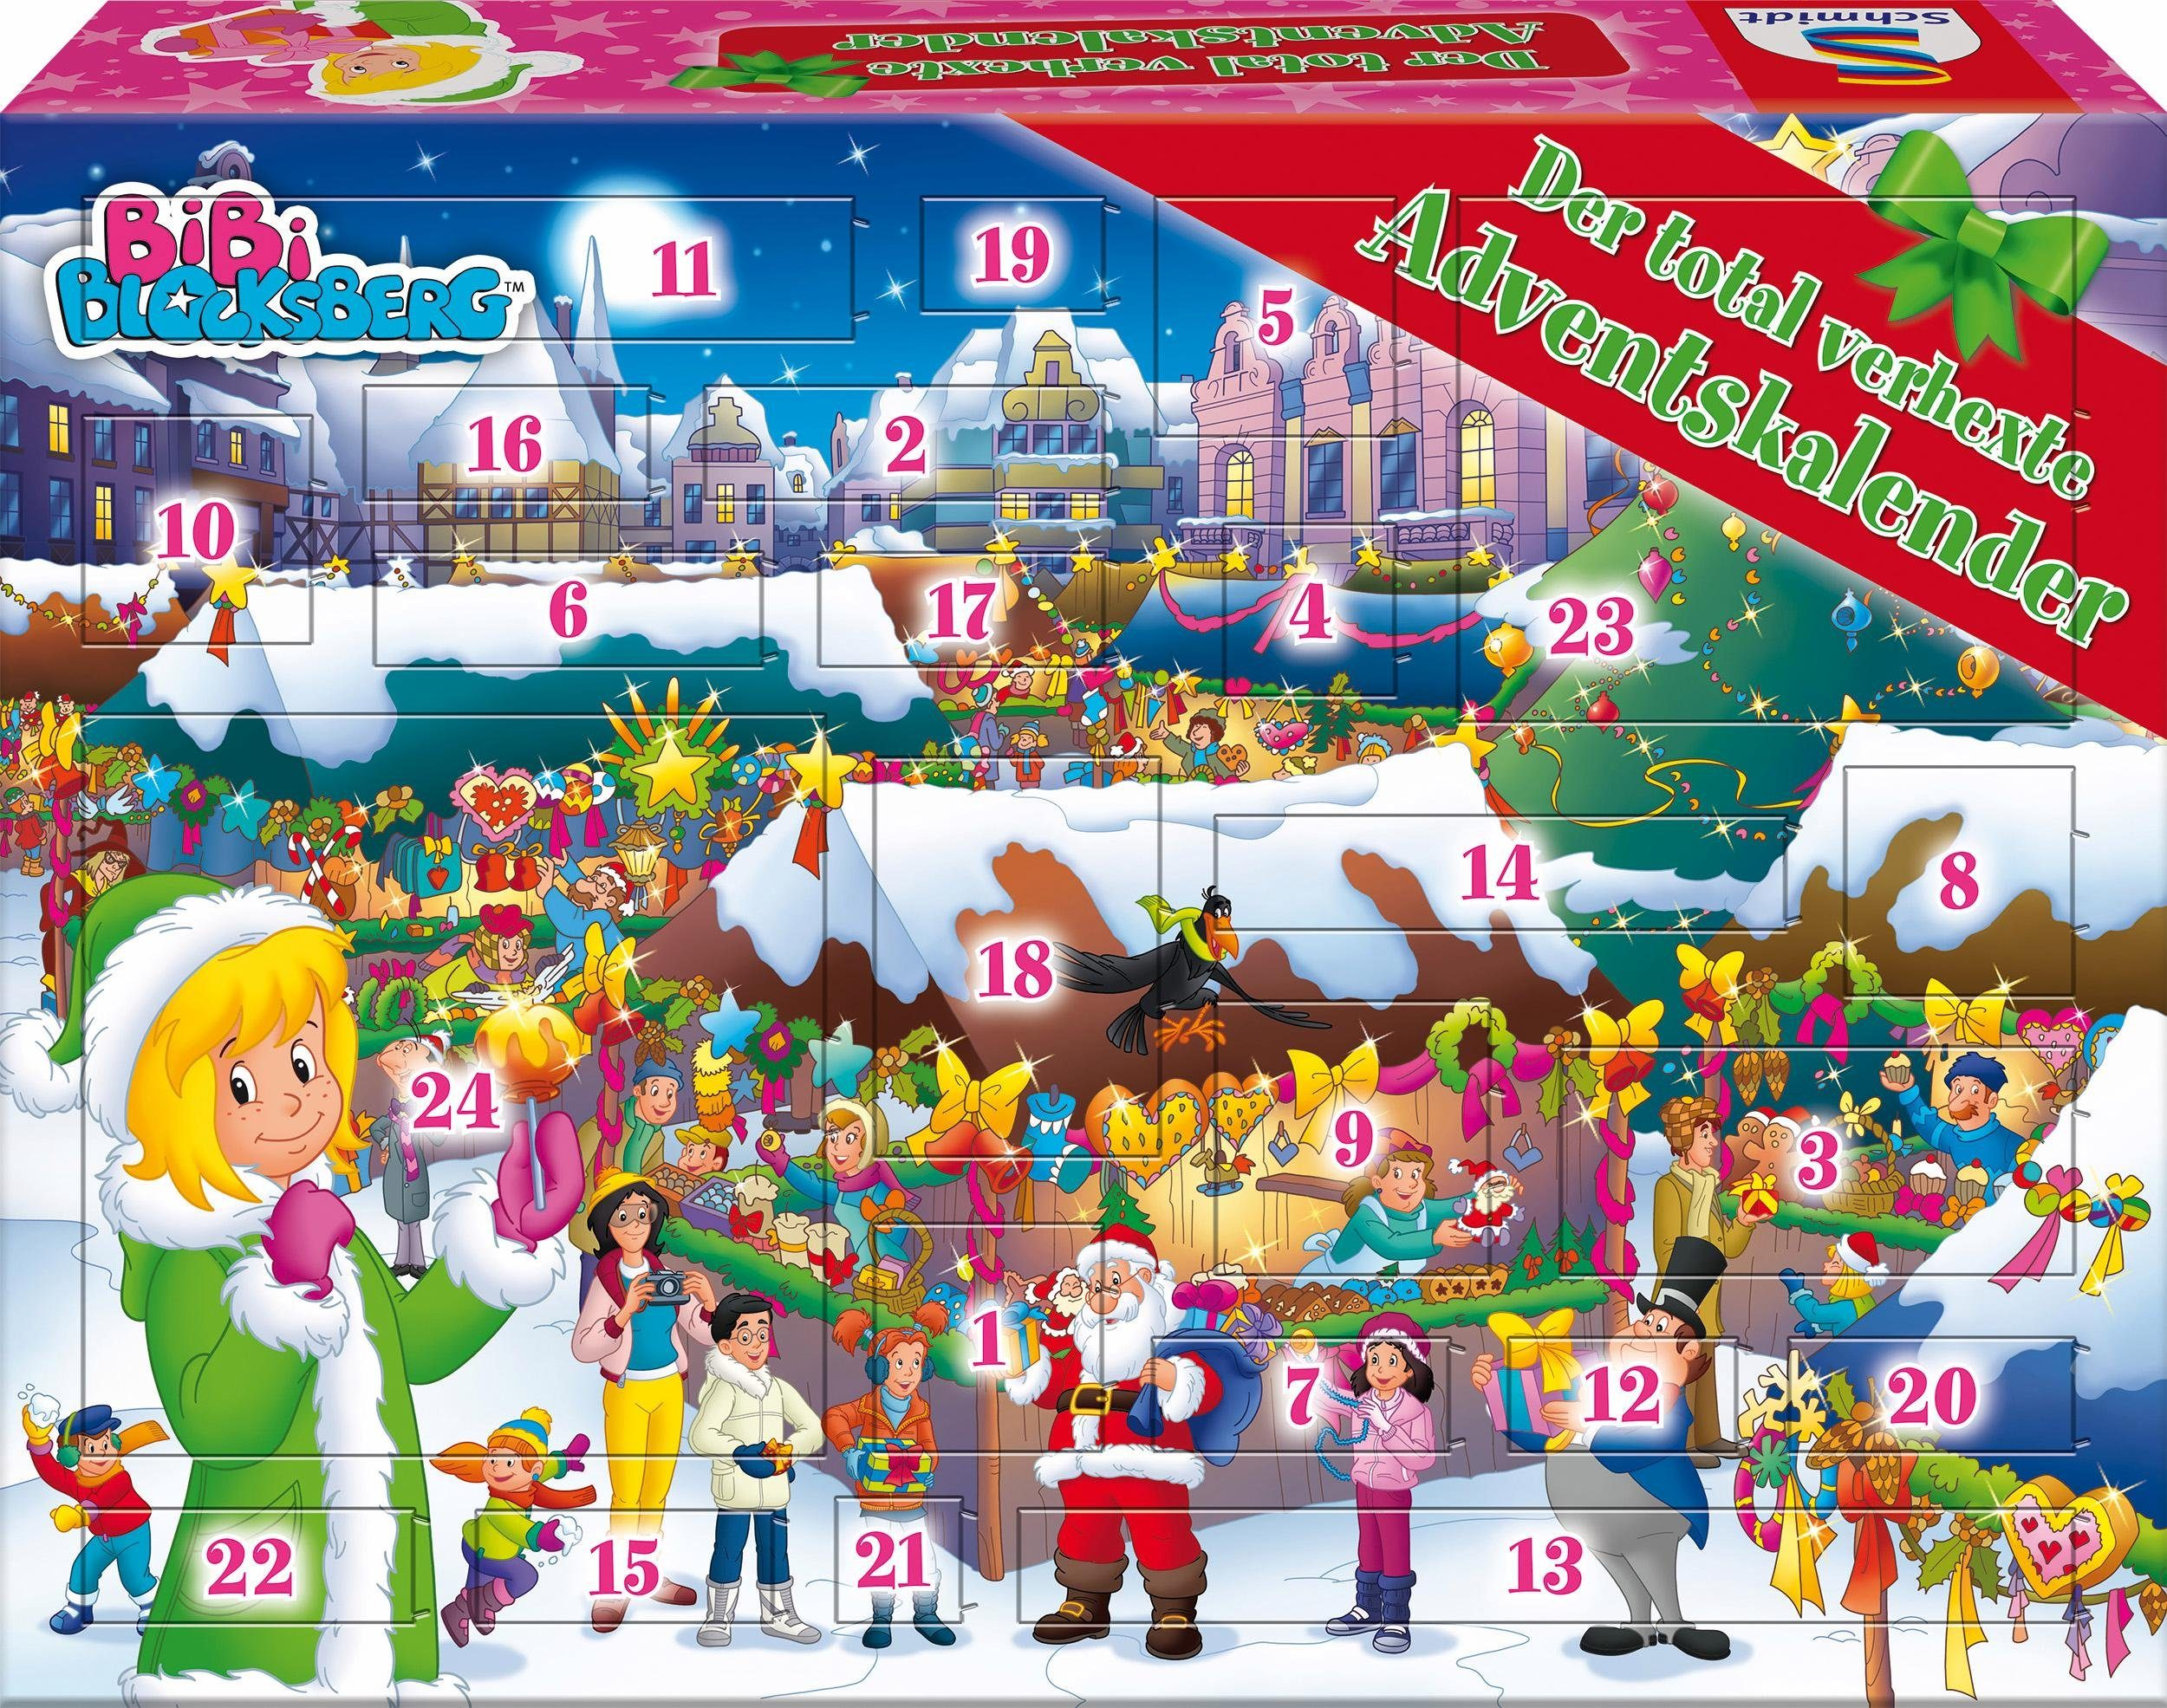 Schmidt Spiele Adventskalender, »Der total verhexte Adventskalender, Bibi Blocksberg ™«